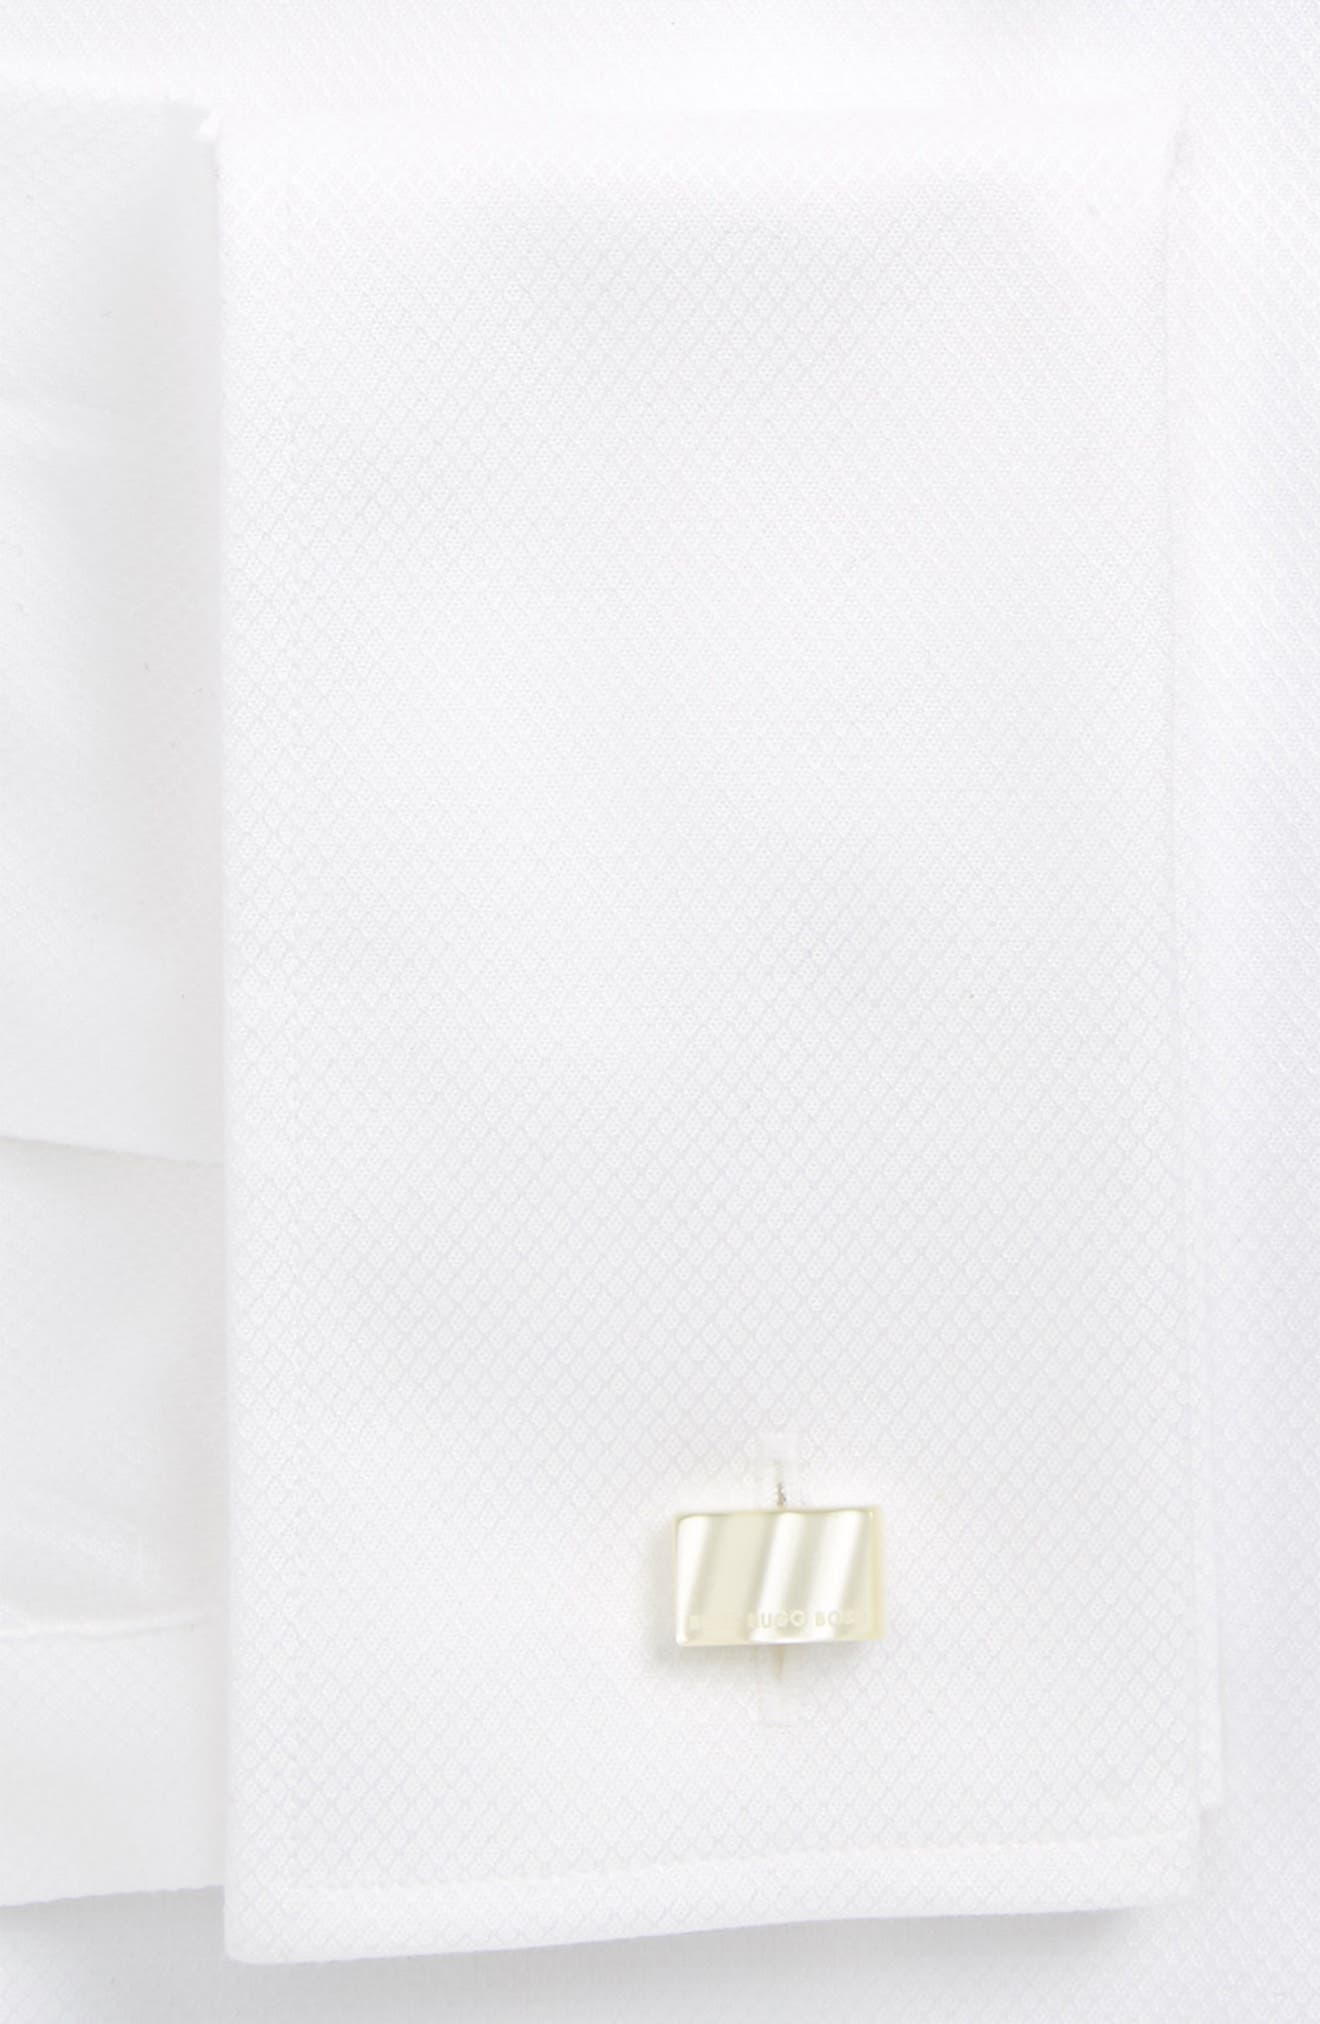 Jameson Slim Fit Diamond Weave French Cuff Tuxedo Shirt,                             Alternate thumbnail 2, color,                             120